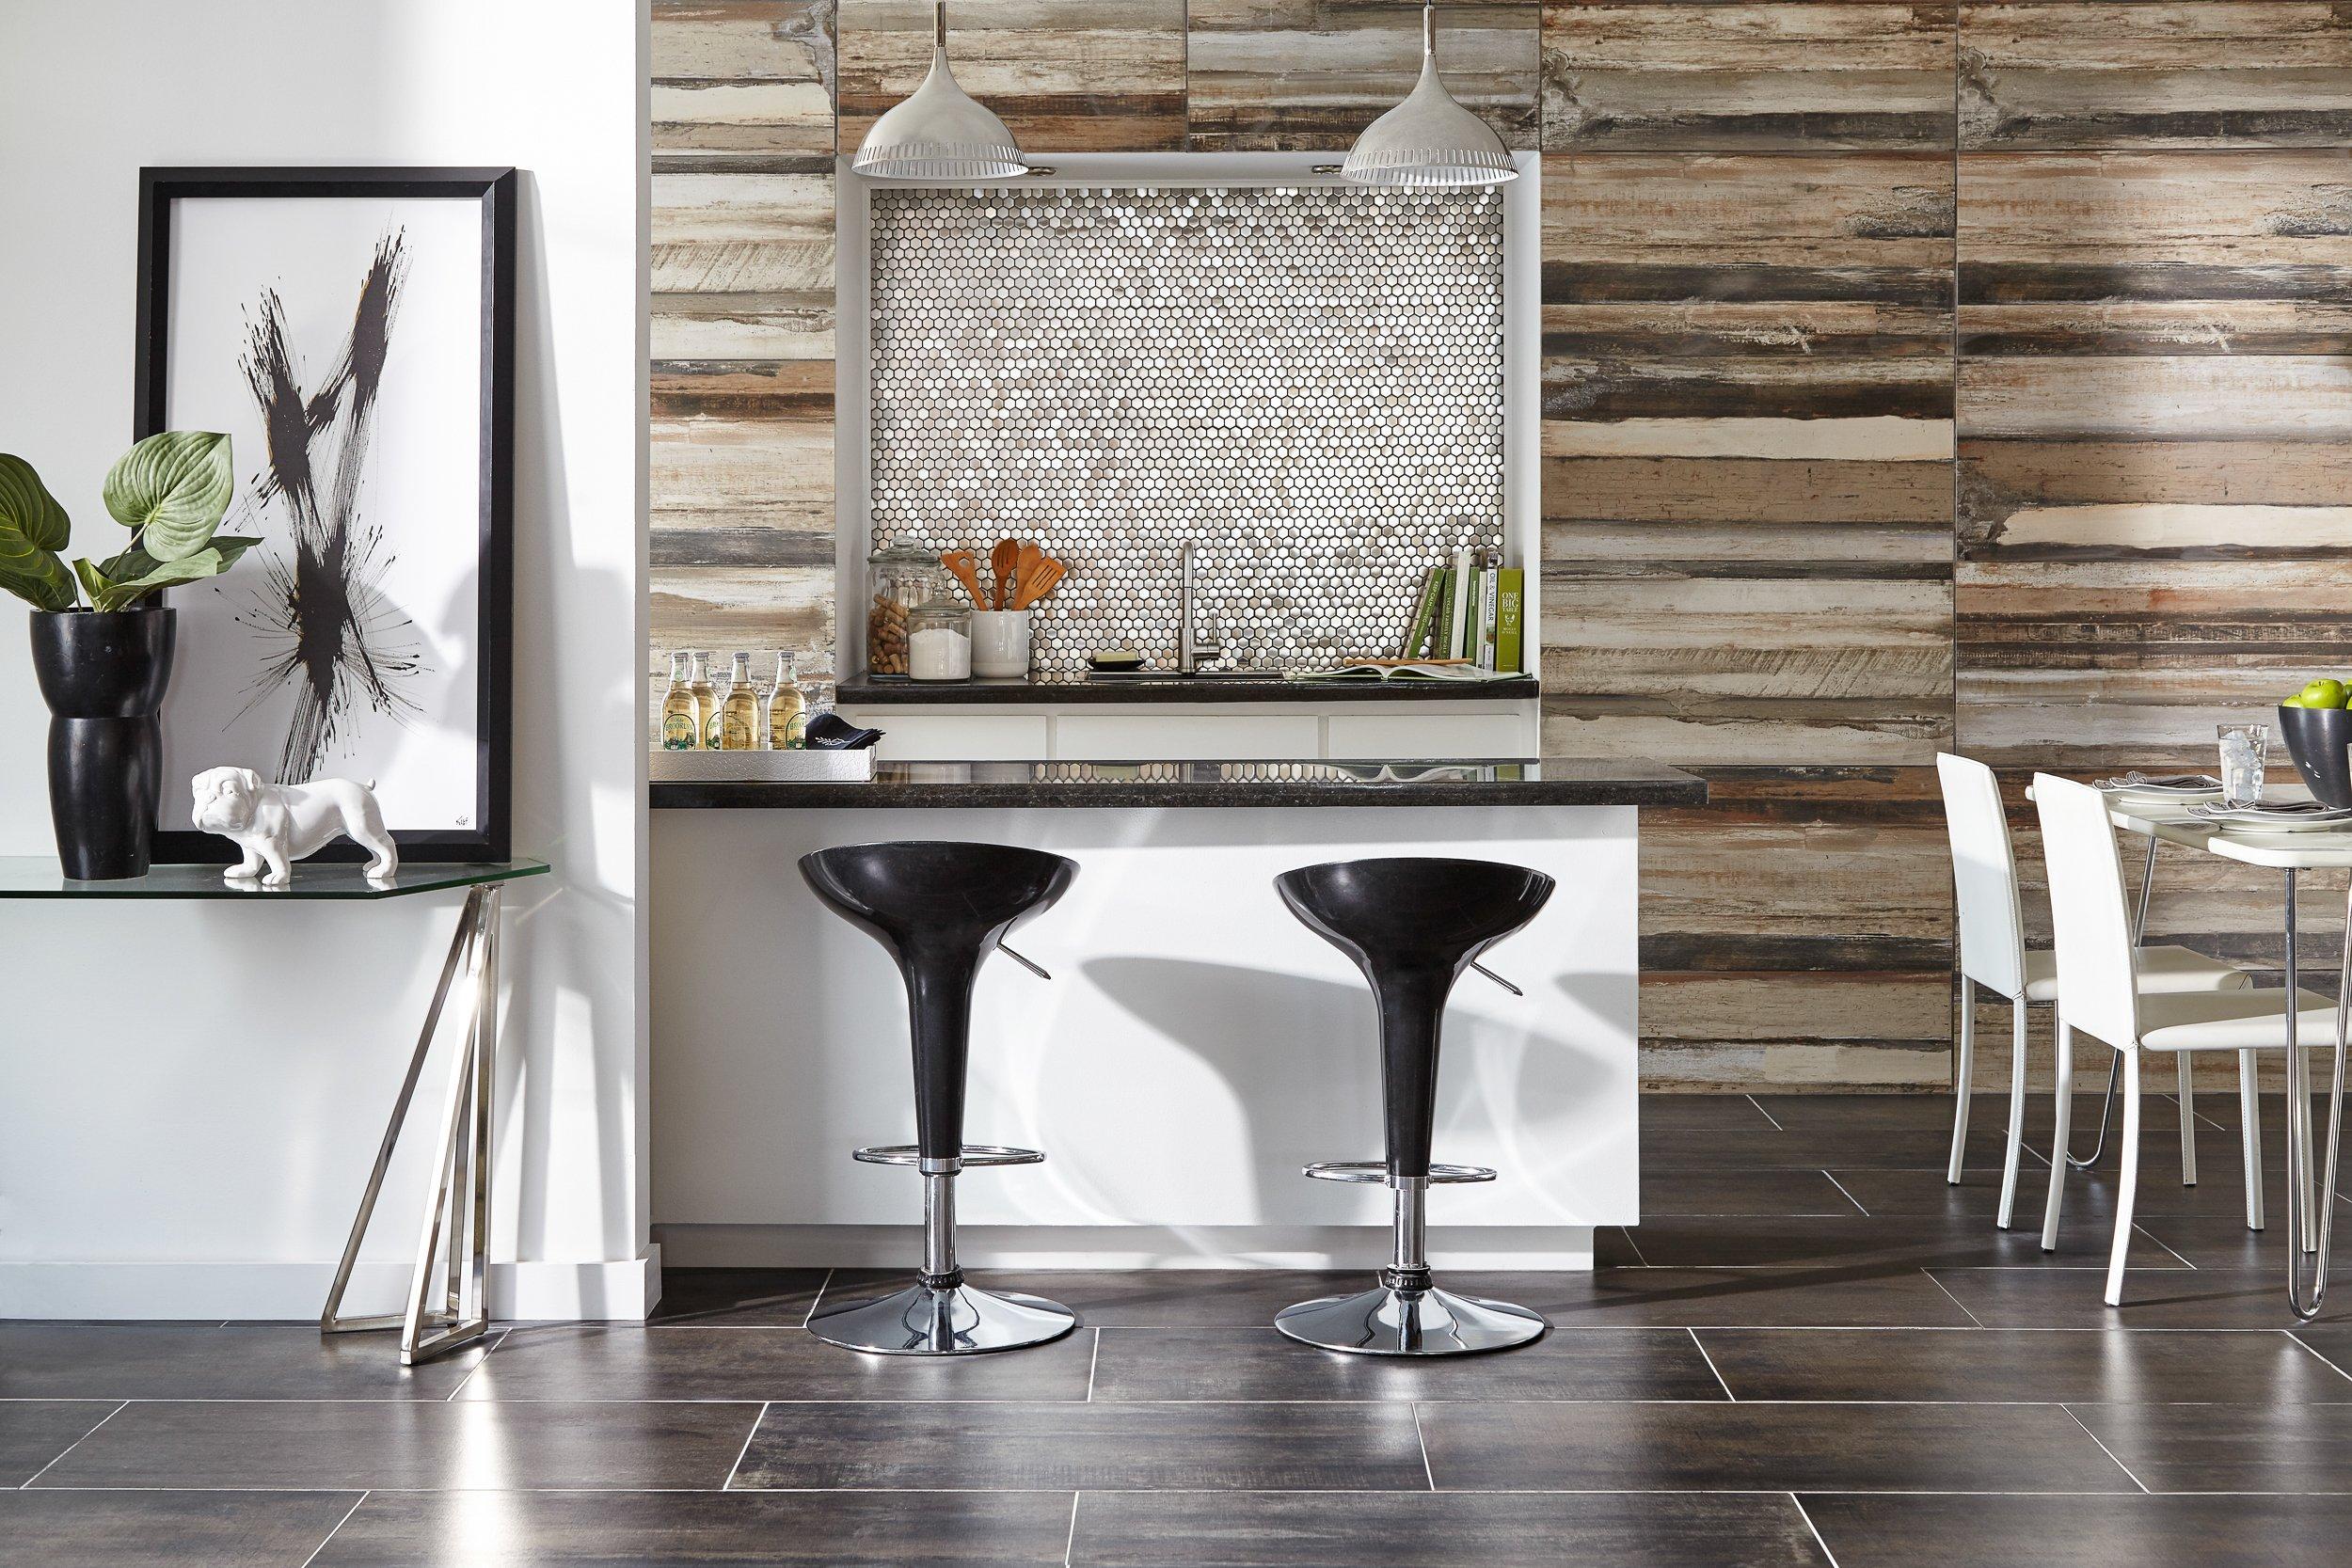 Kitchen And Floor Decor | Contemporary Gallery Floor Decor